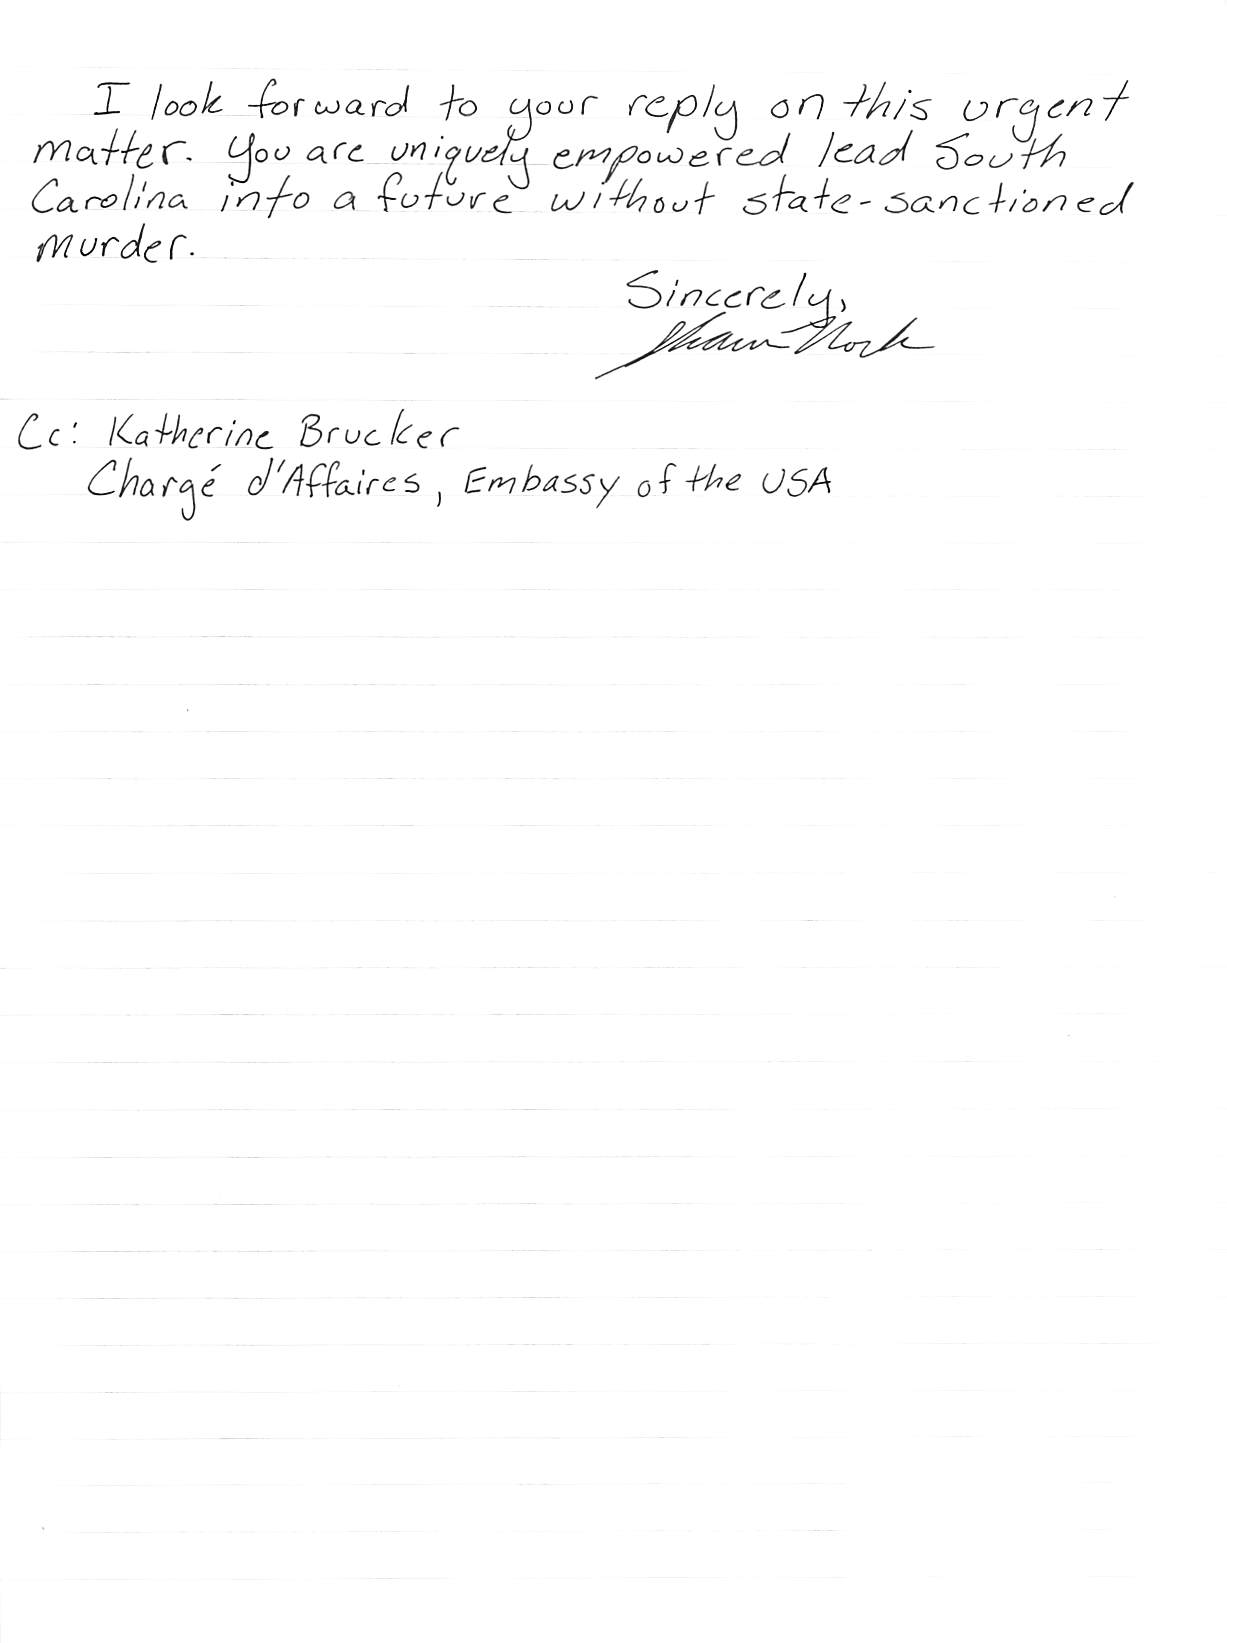 handwritten letter, page 2, transcript follows